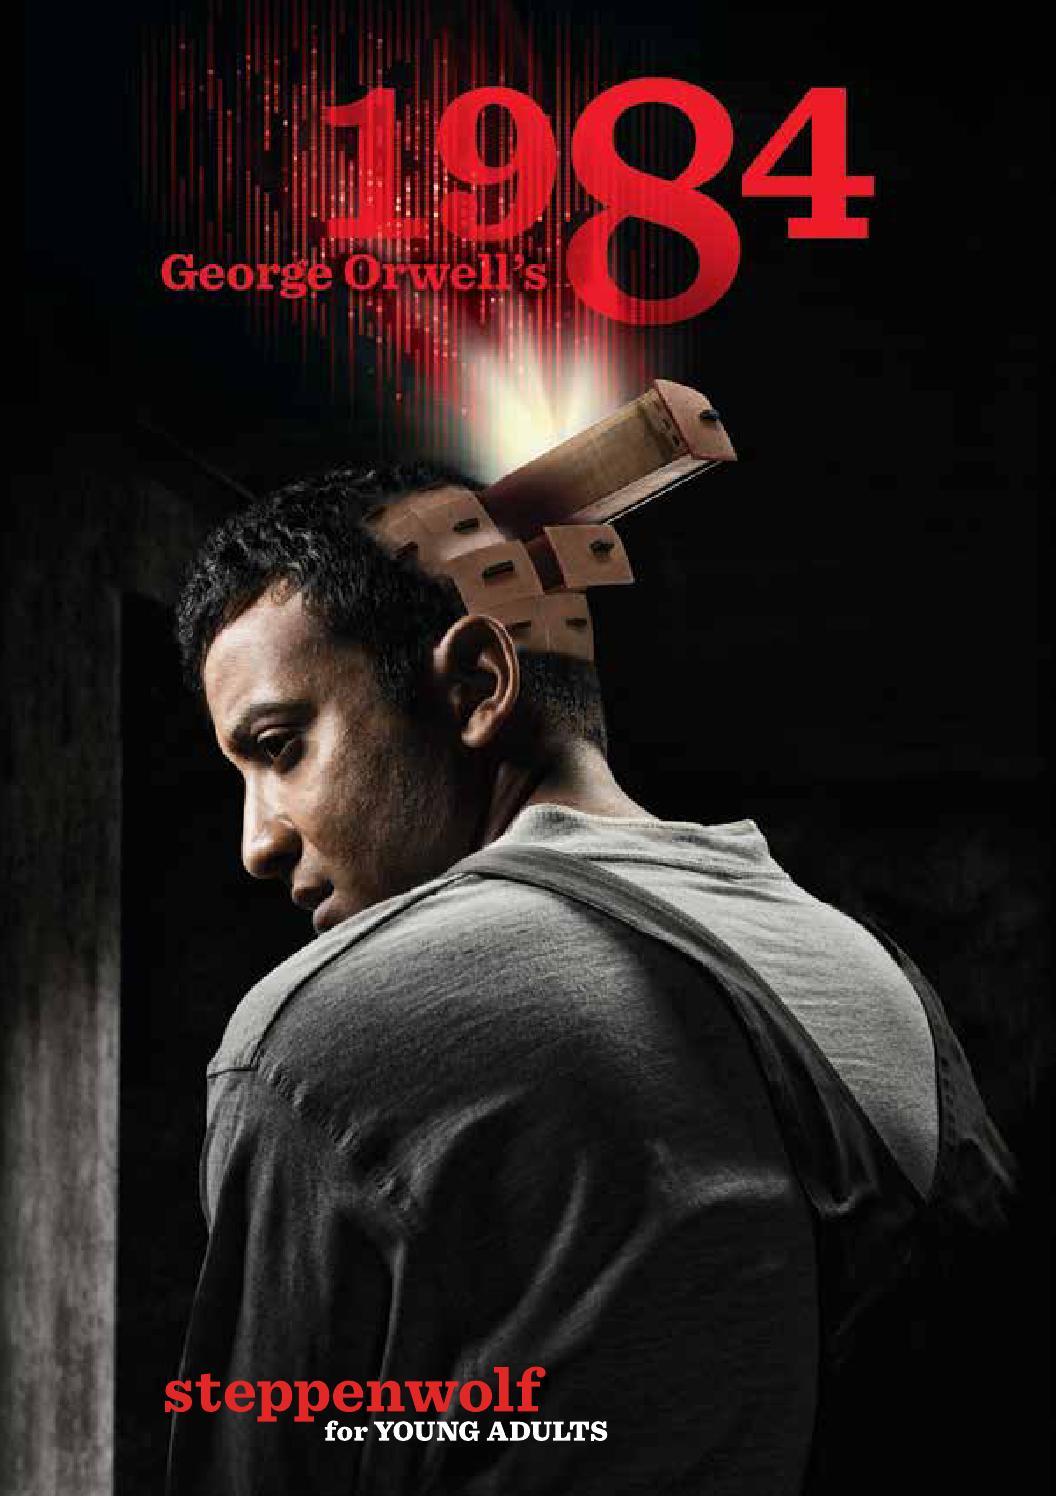 george orwell u0027s 1984 program by steppenwolf theatre company issuu